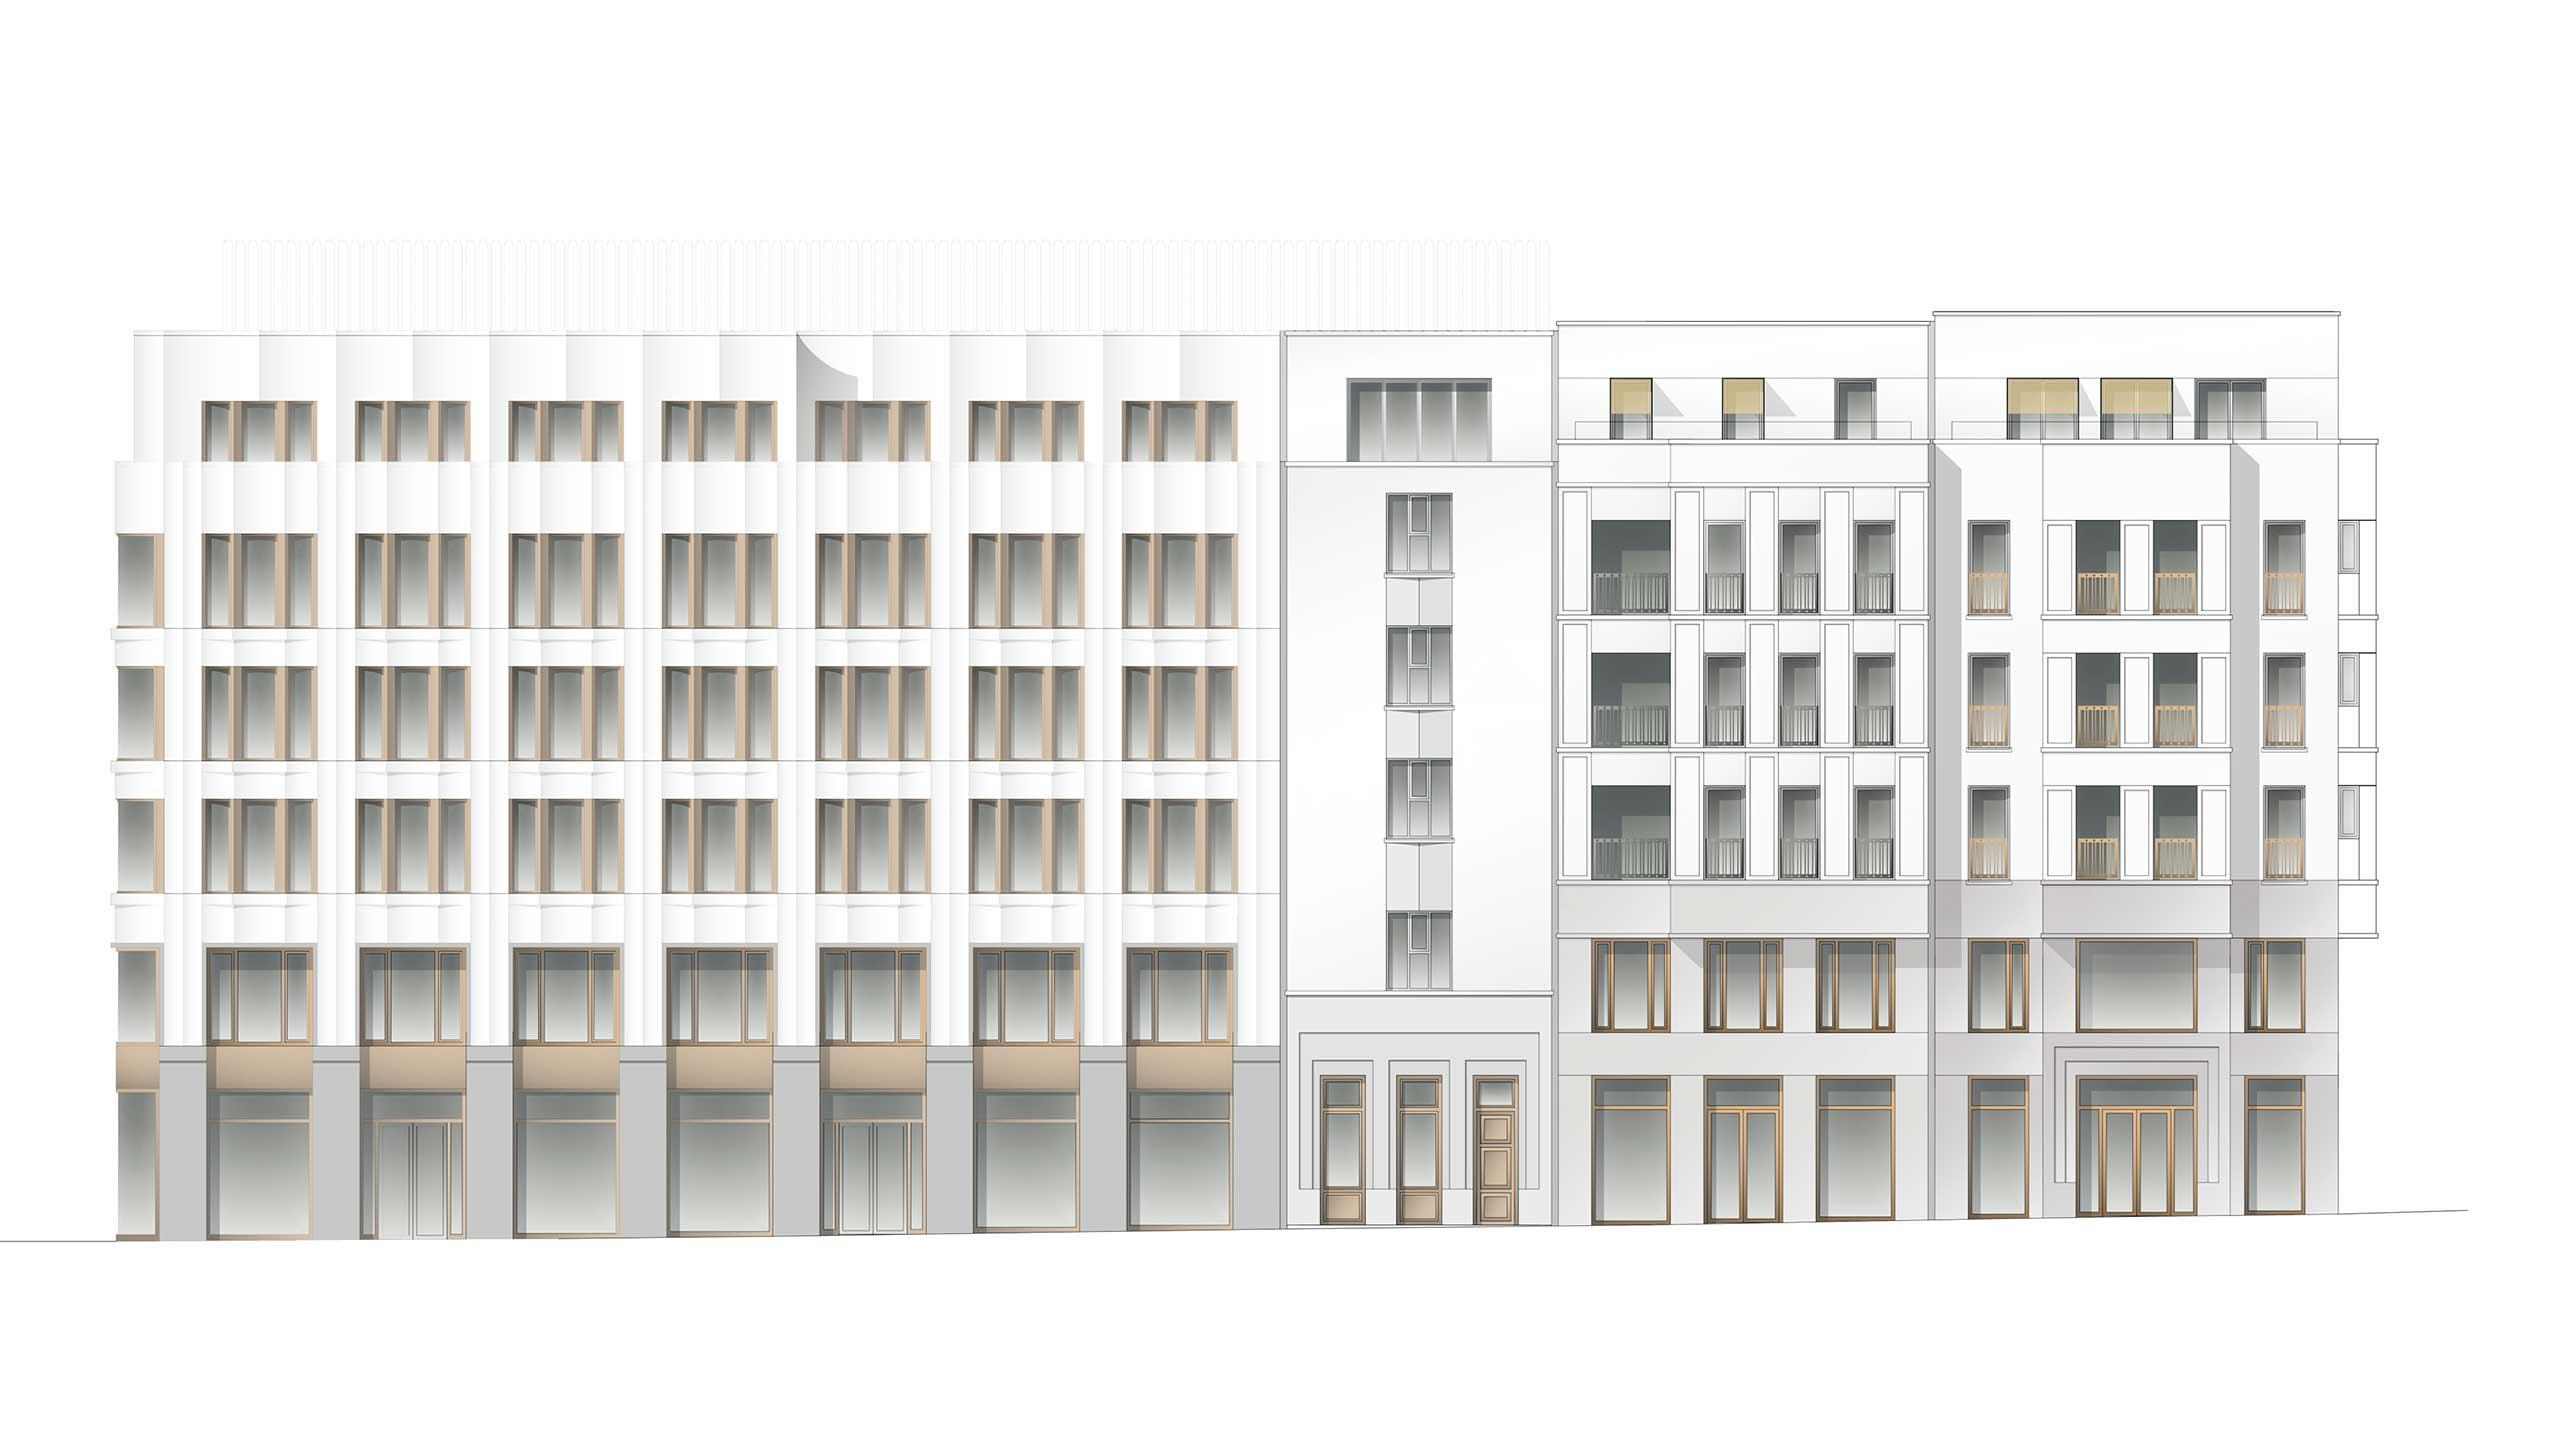 Bernsteincarré Fassade Planung